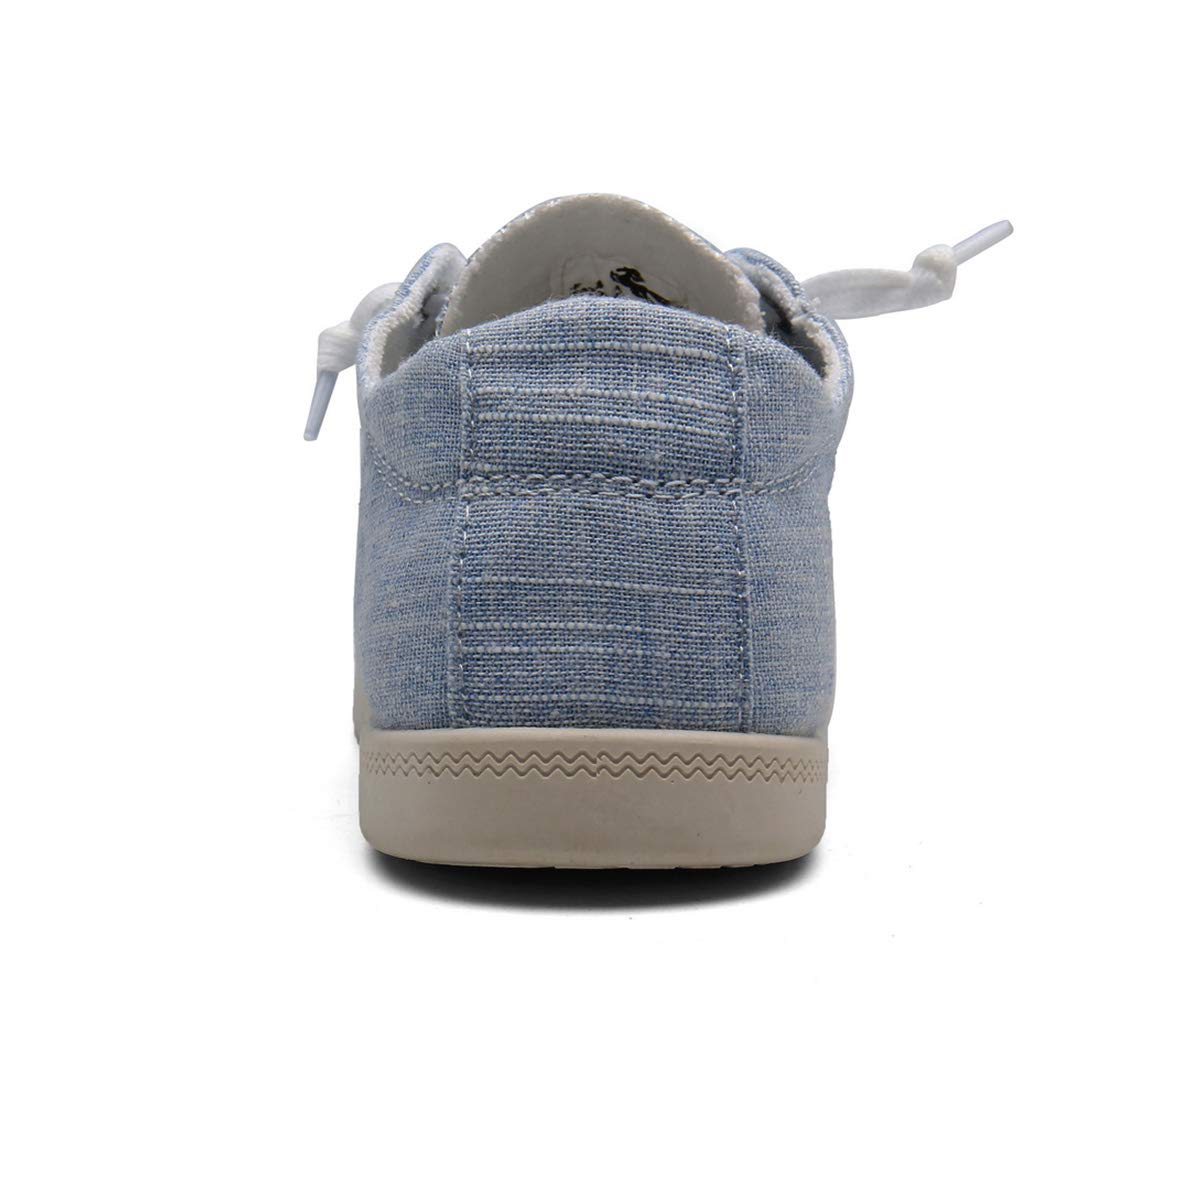 KELYR Women Fashion Sneaker Slip On Shoes Canvas Classic&Comfort Light Blue